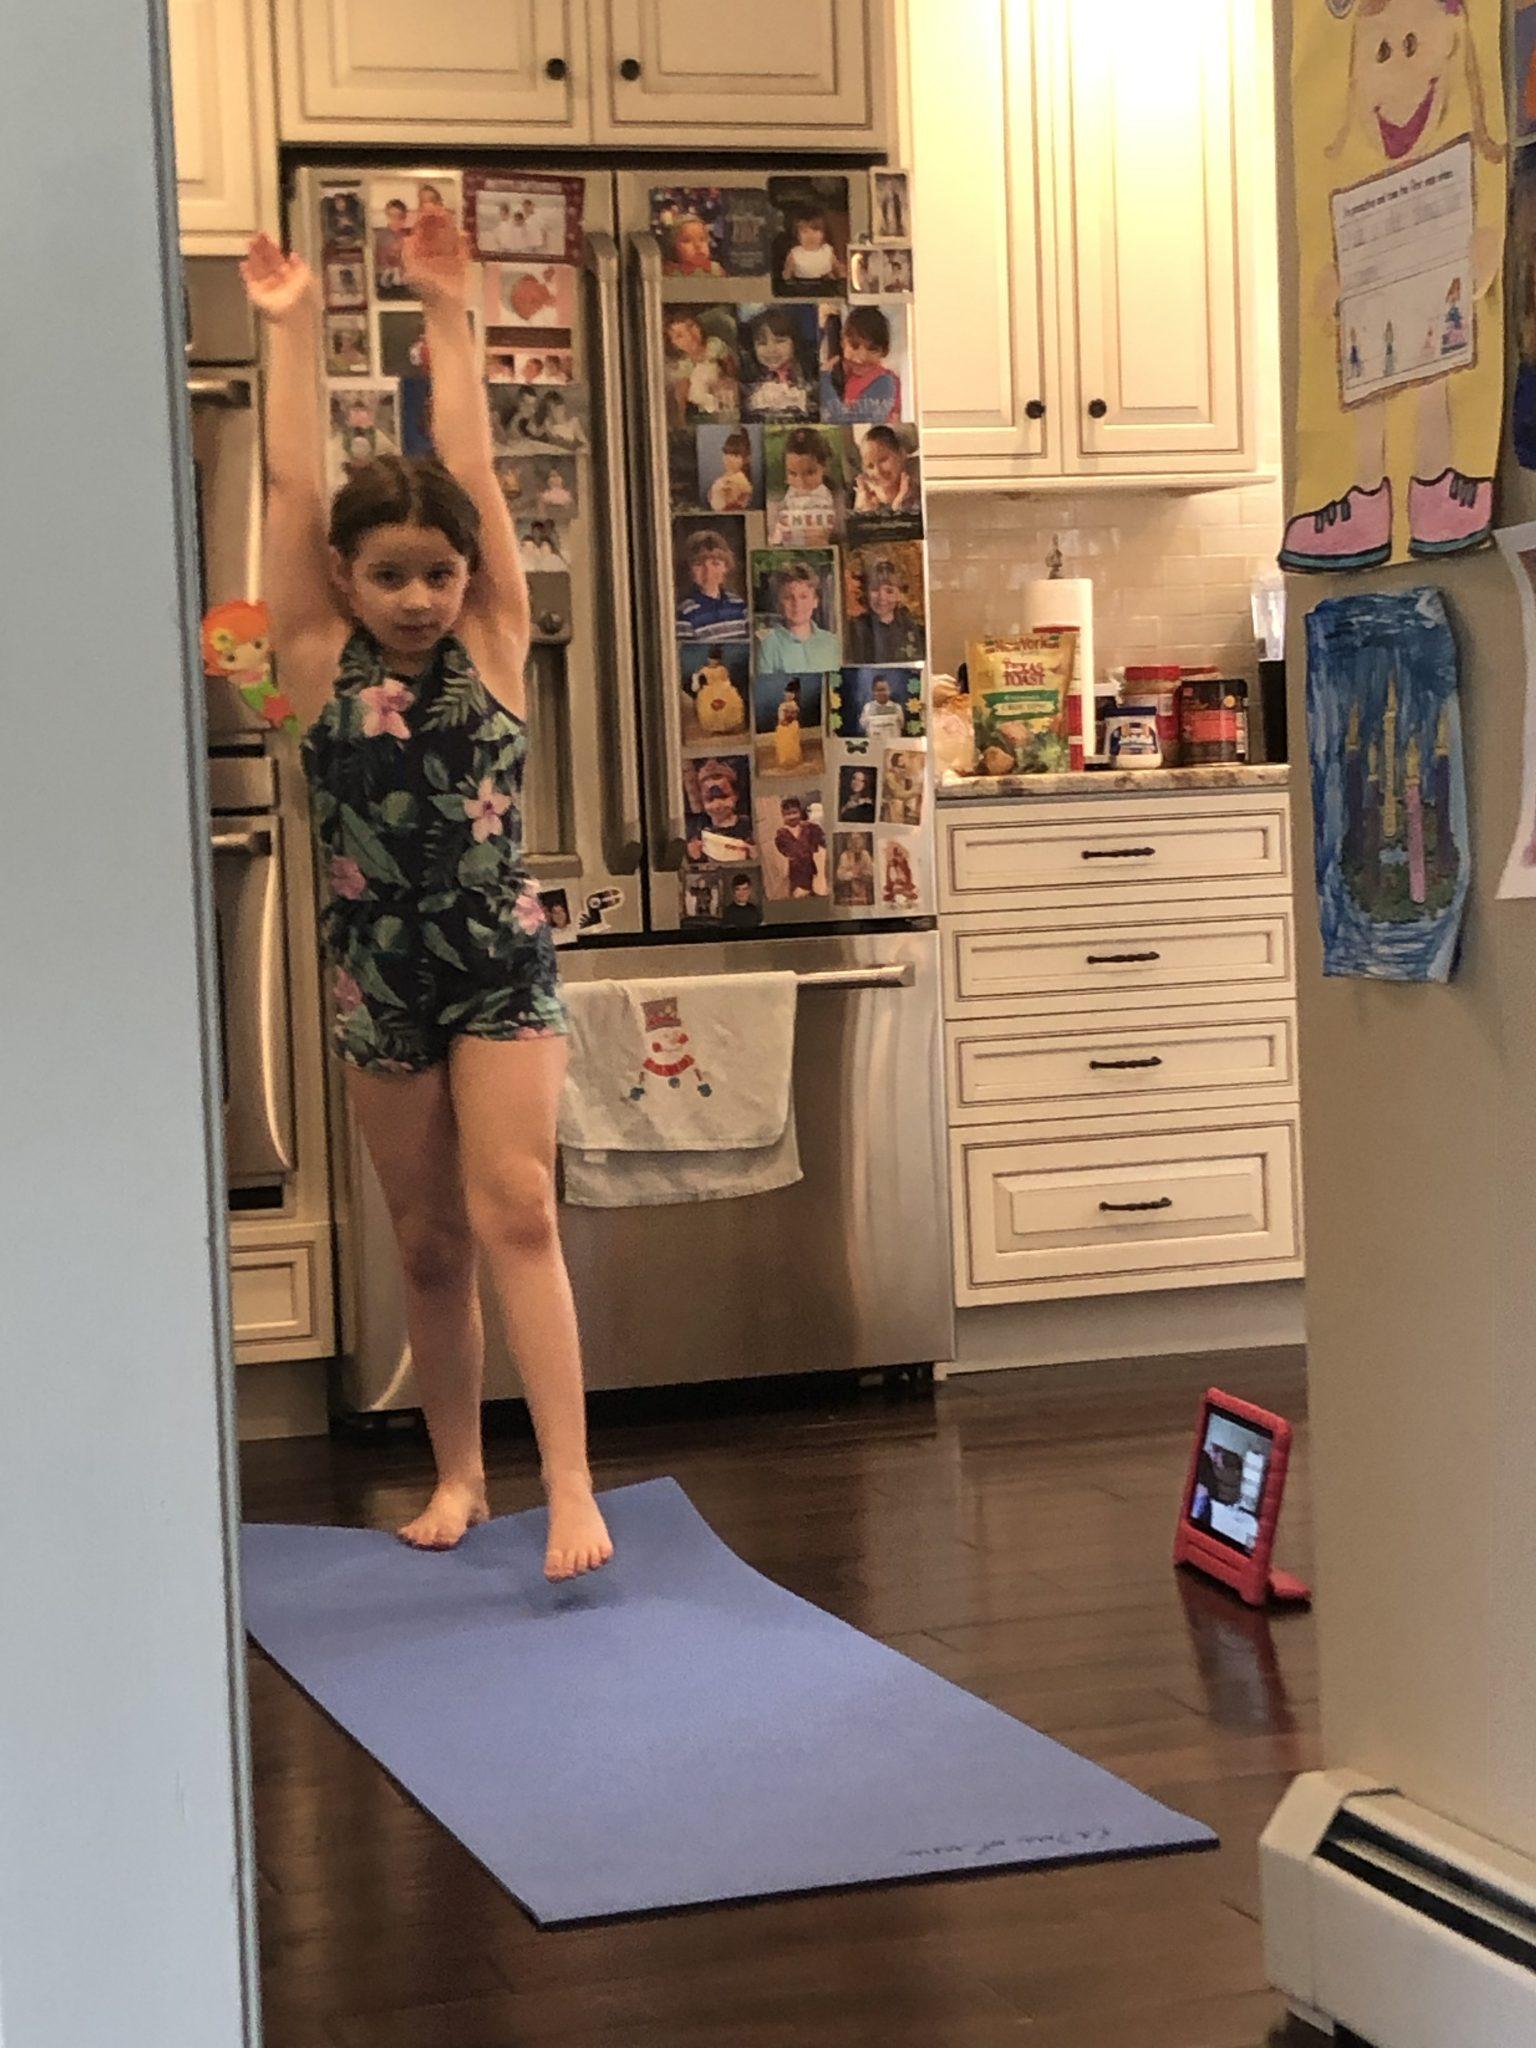 Child doing gymnastics